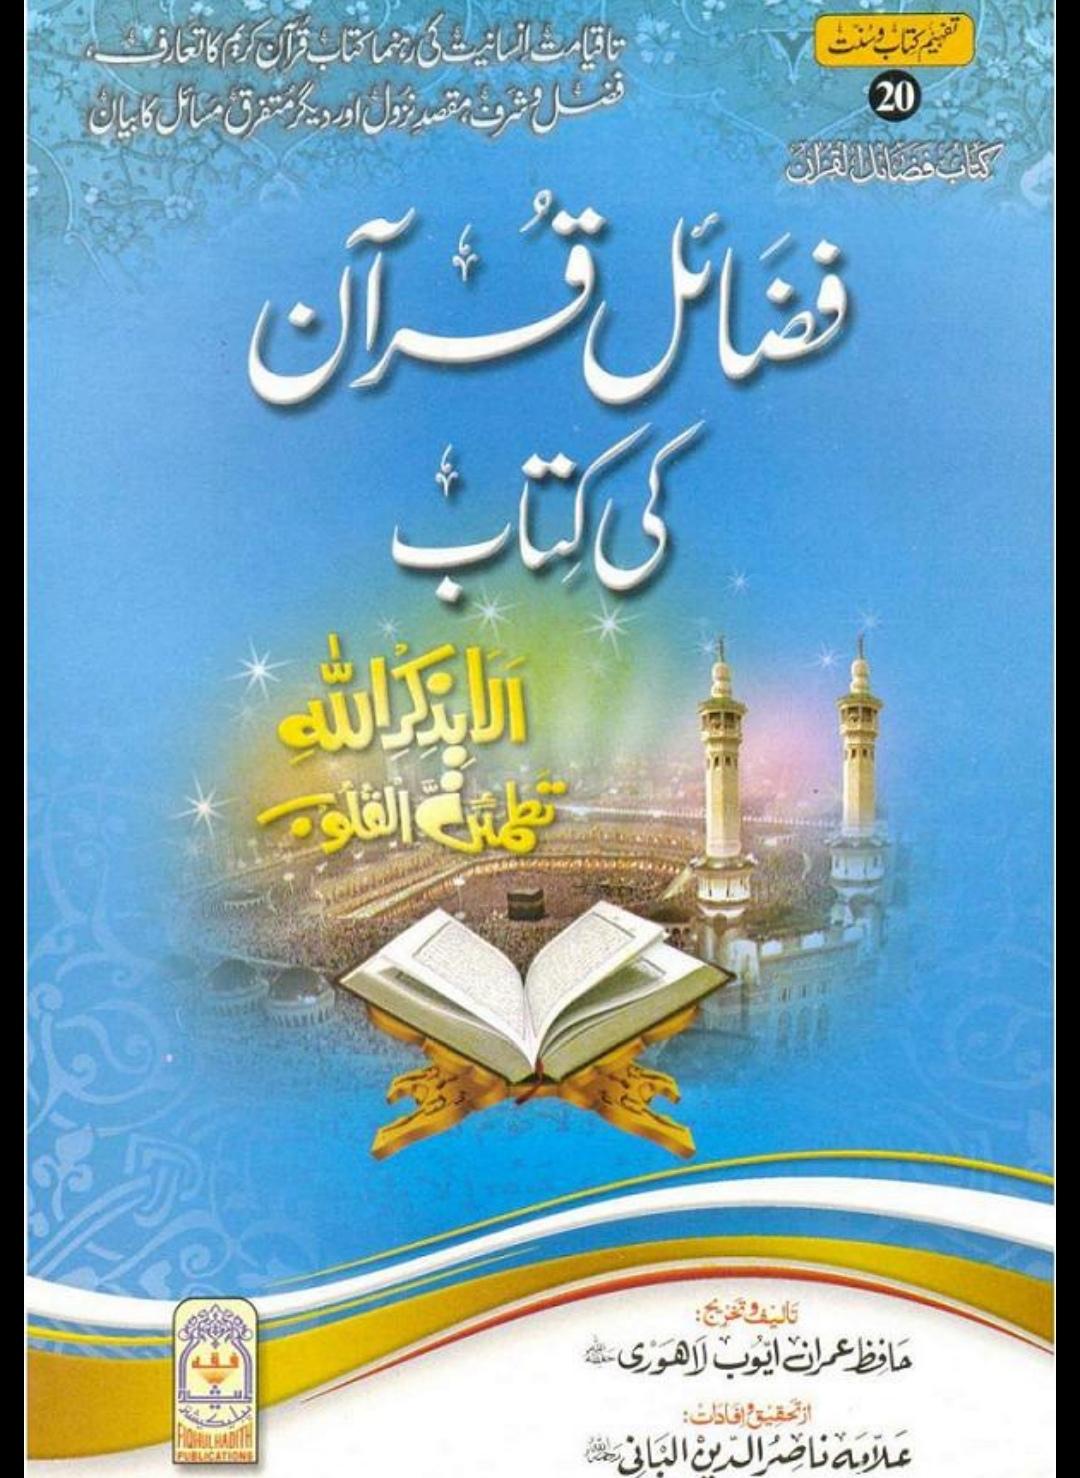 Fazail-e-Quran Ki Kitab pdf - Top Rated Pakistani NewsPapers